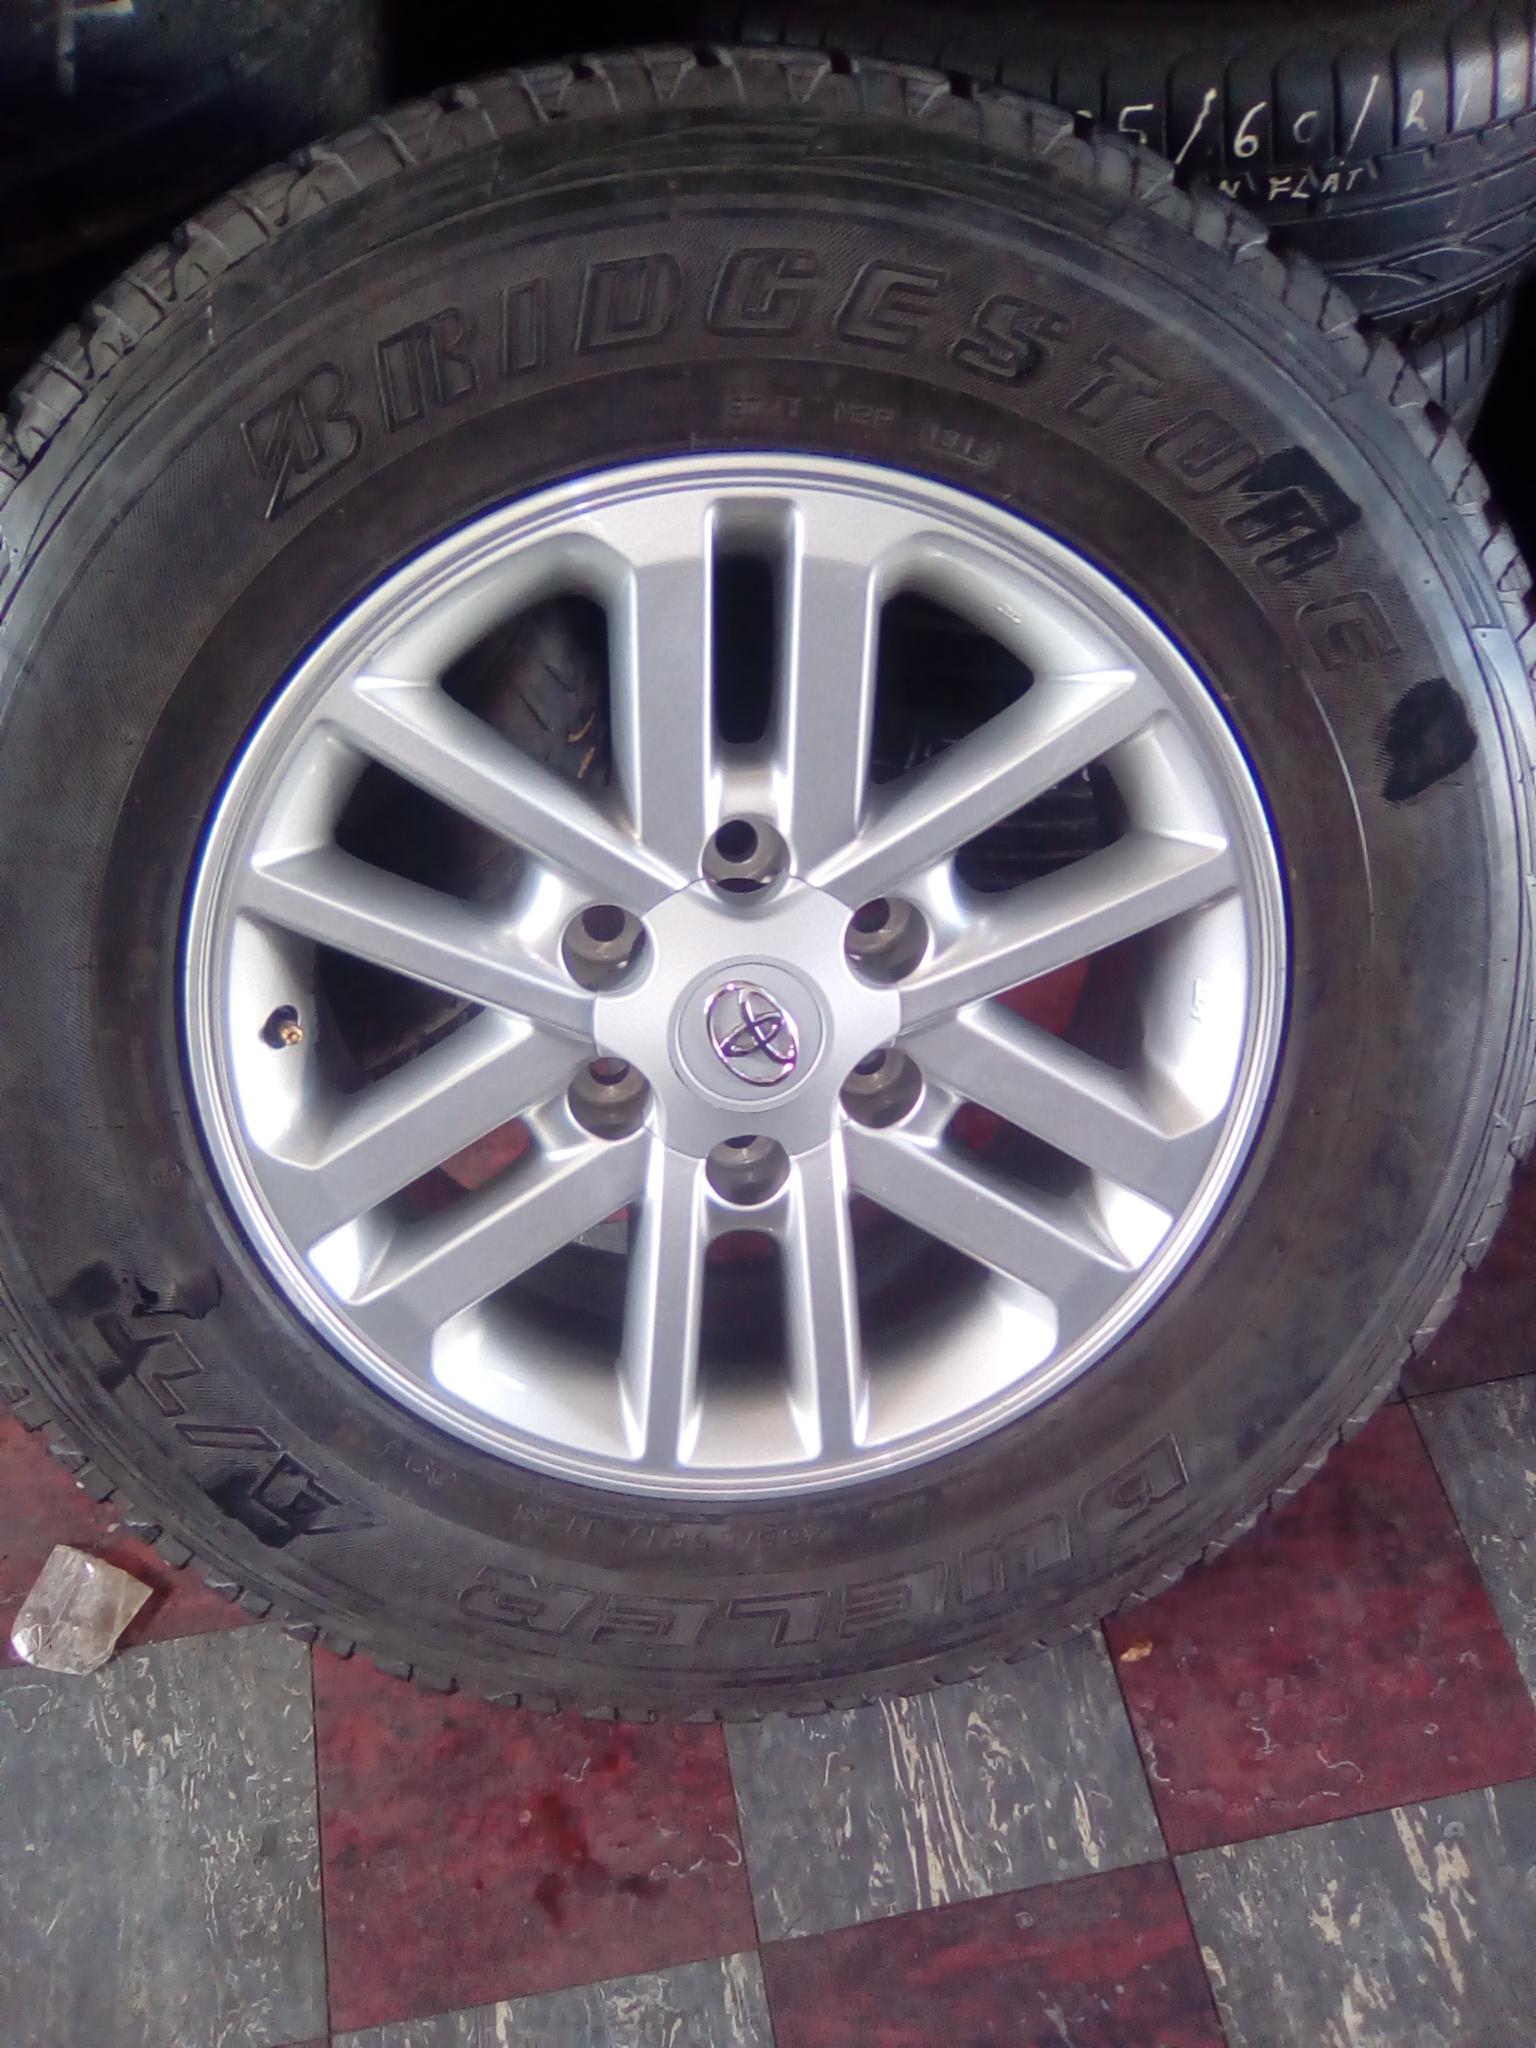 Bridgestone tyre and rim